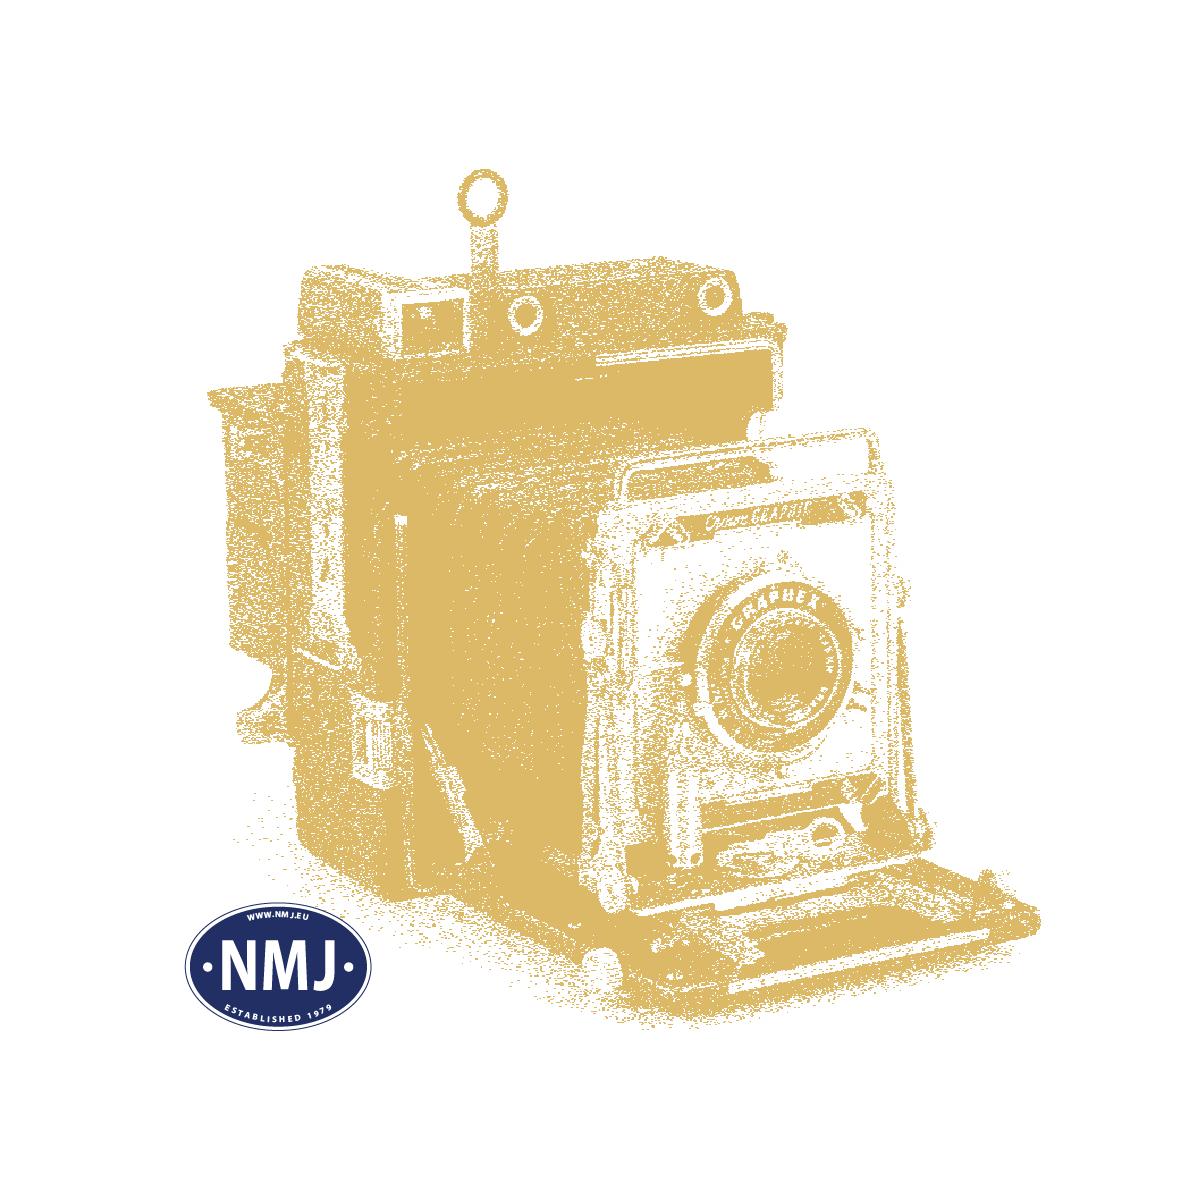 NMJT84.301 - NMJ Topline NSB BM69A.11, DC